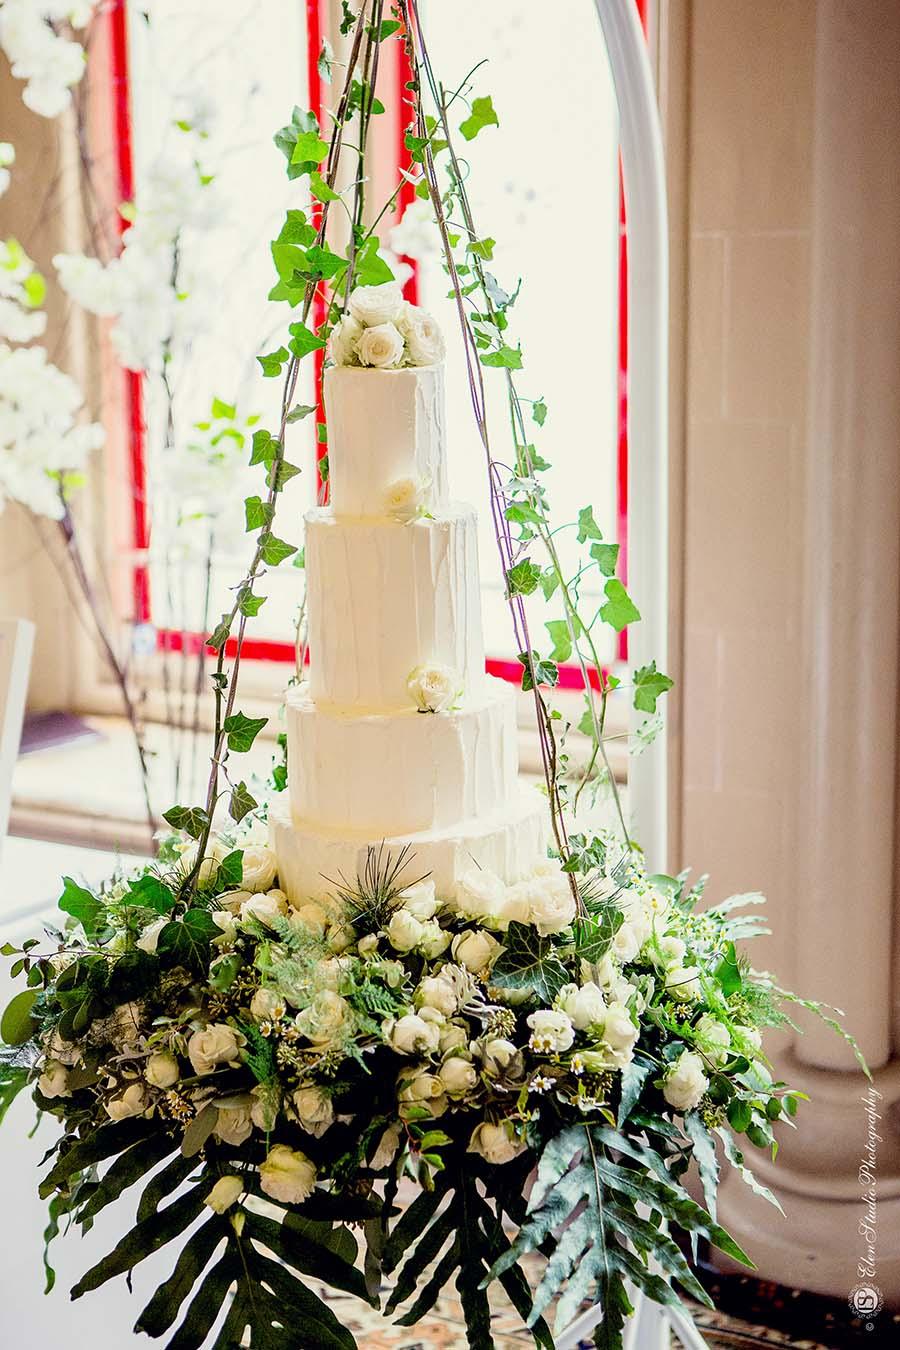 Belvoir-Castle-wedding-fair-Elen-Studio-Photography-003